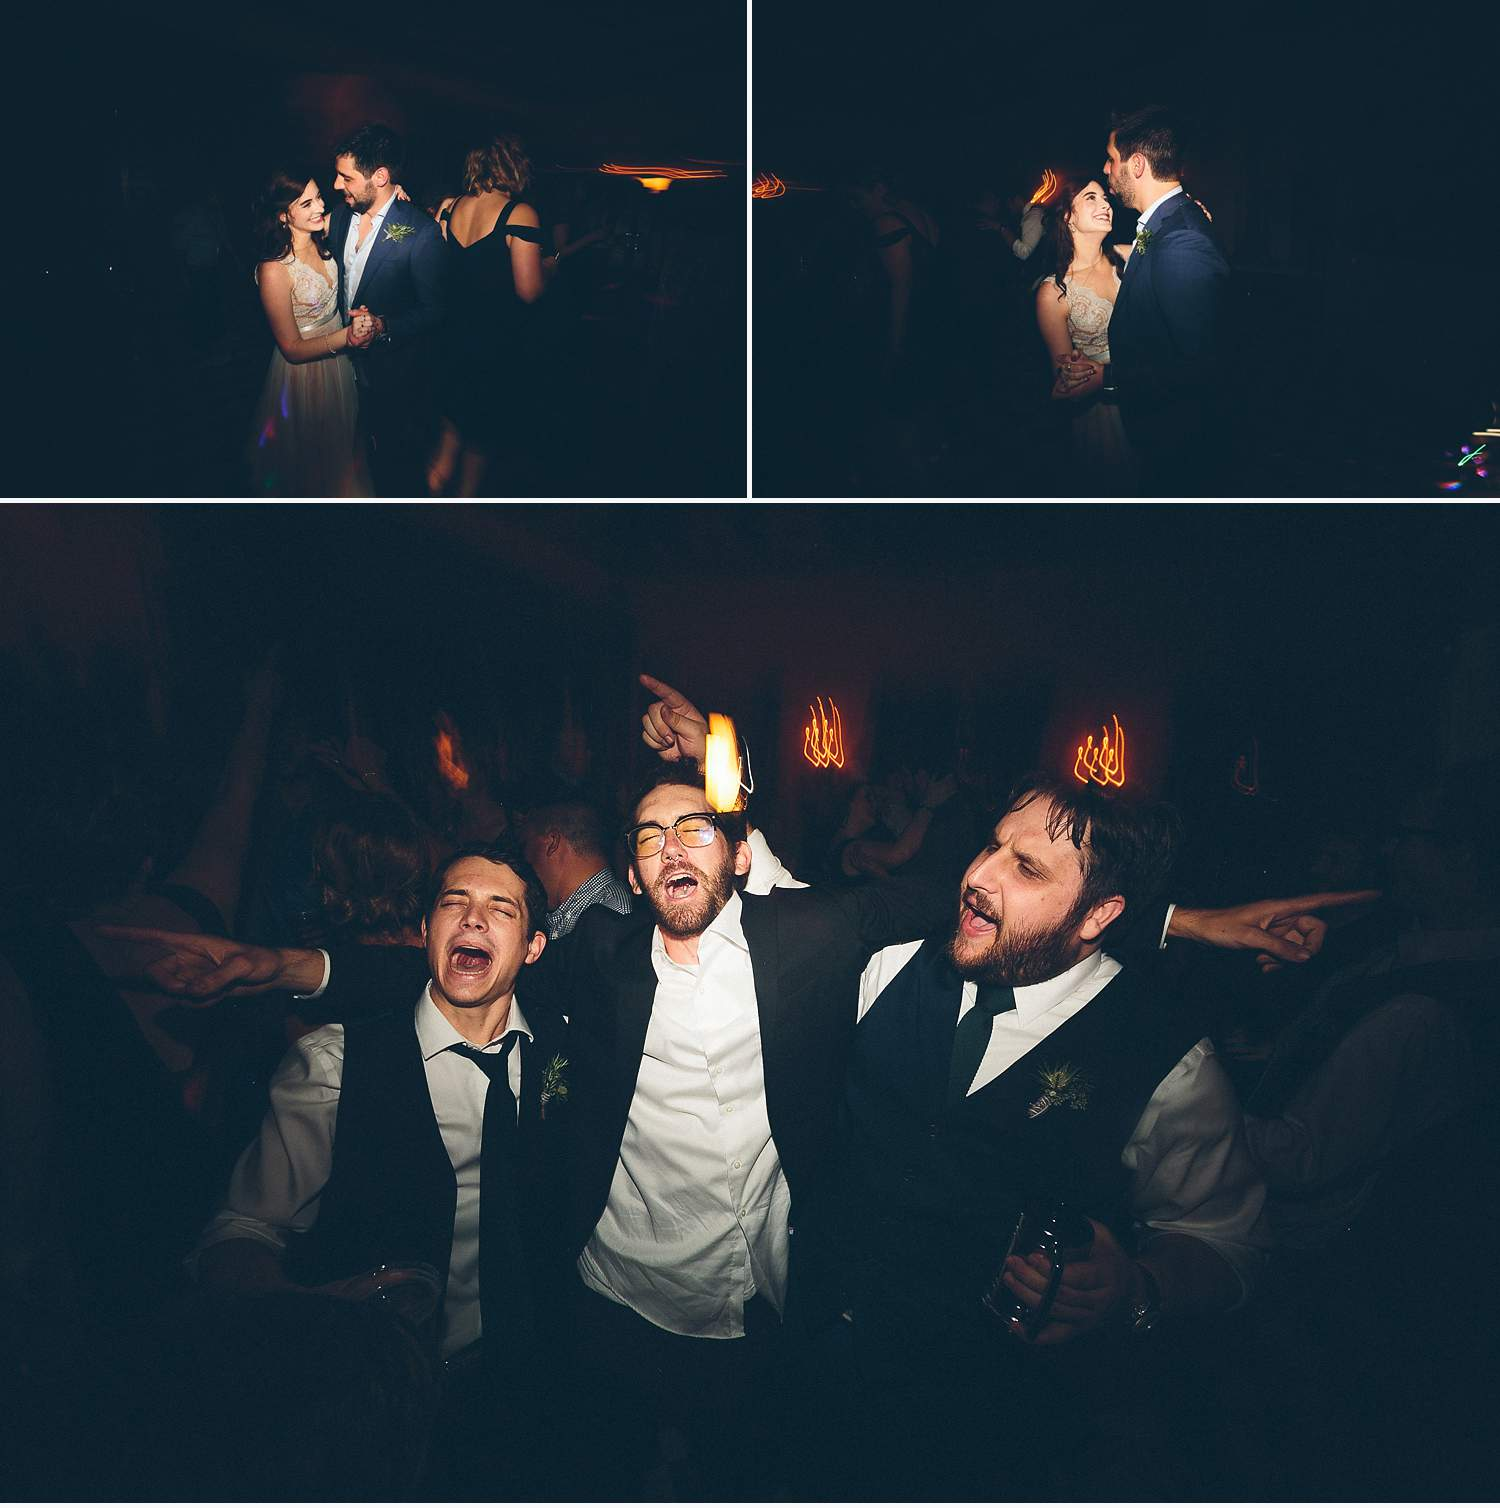 deering-estate-wedding-photographer-daniel-lateulade-037.JPG